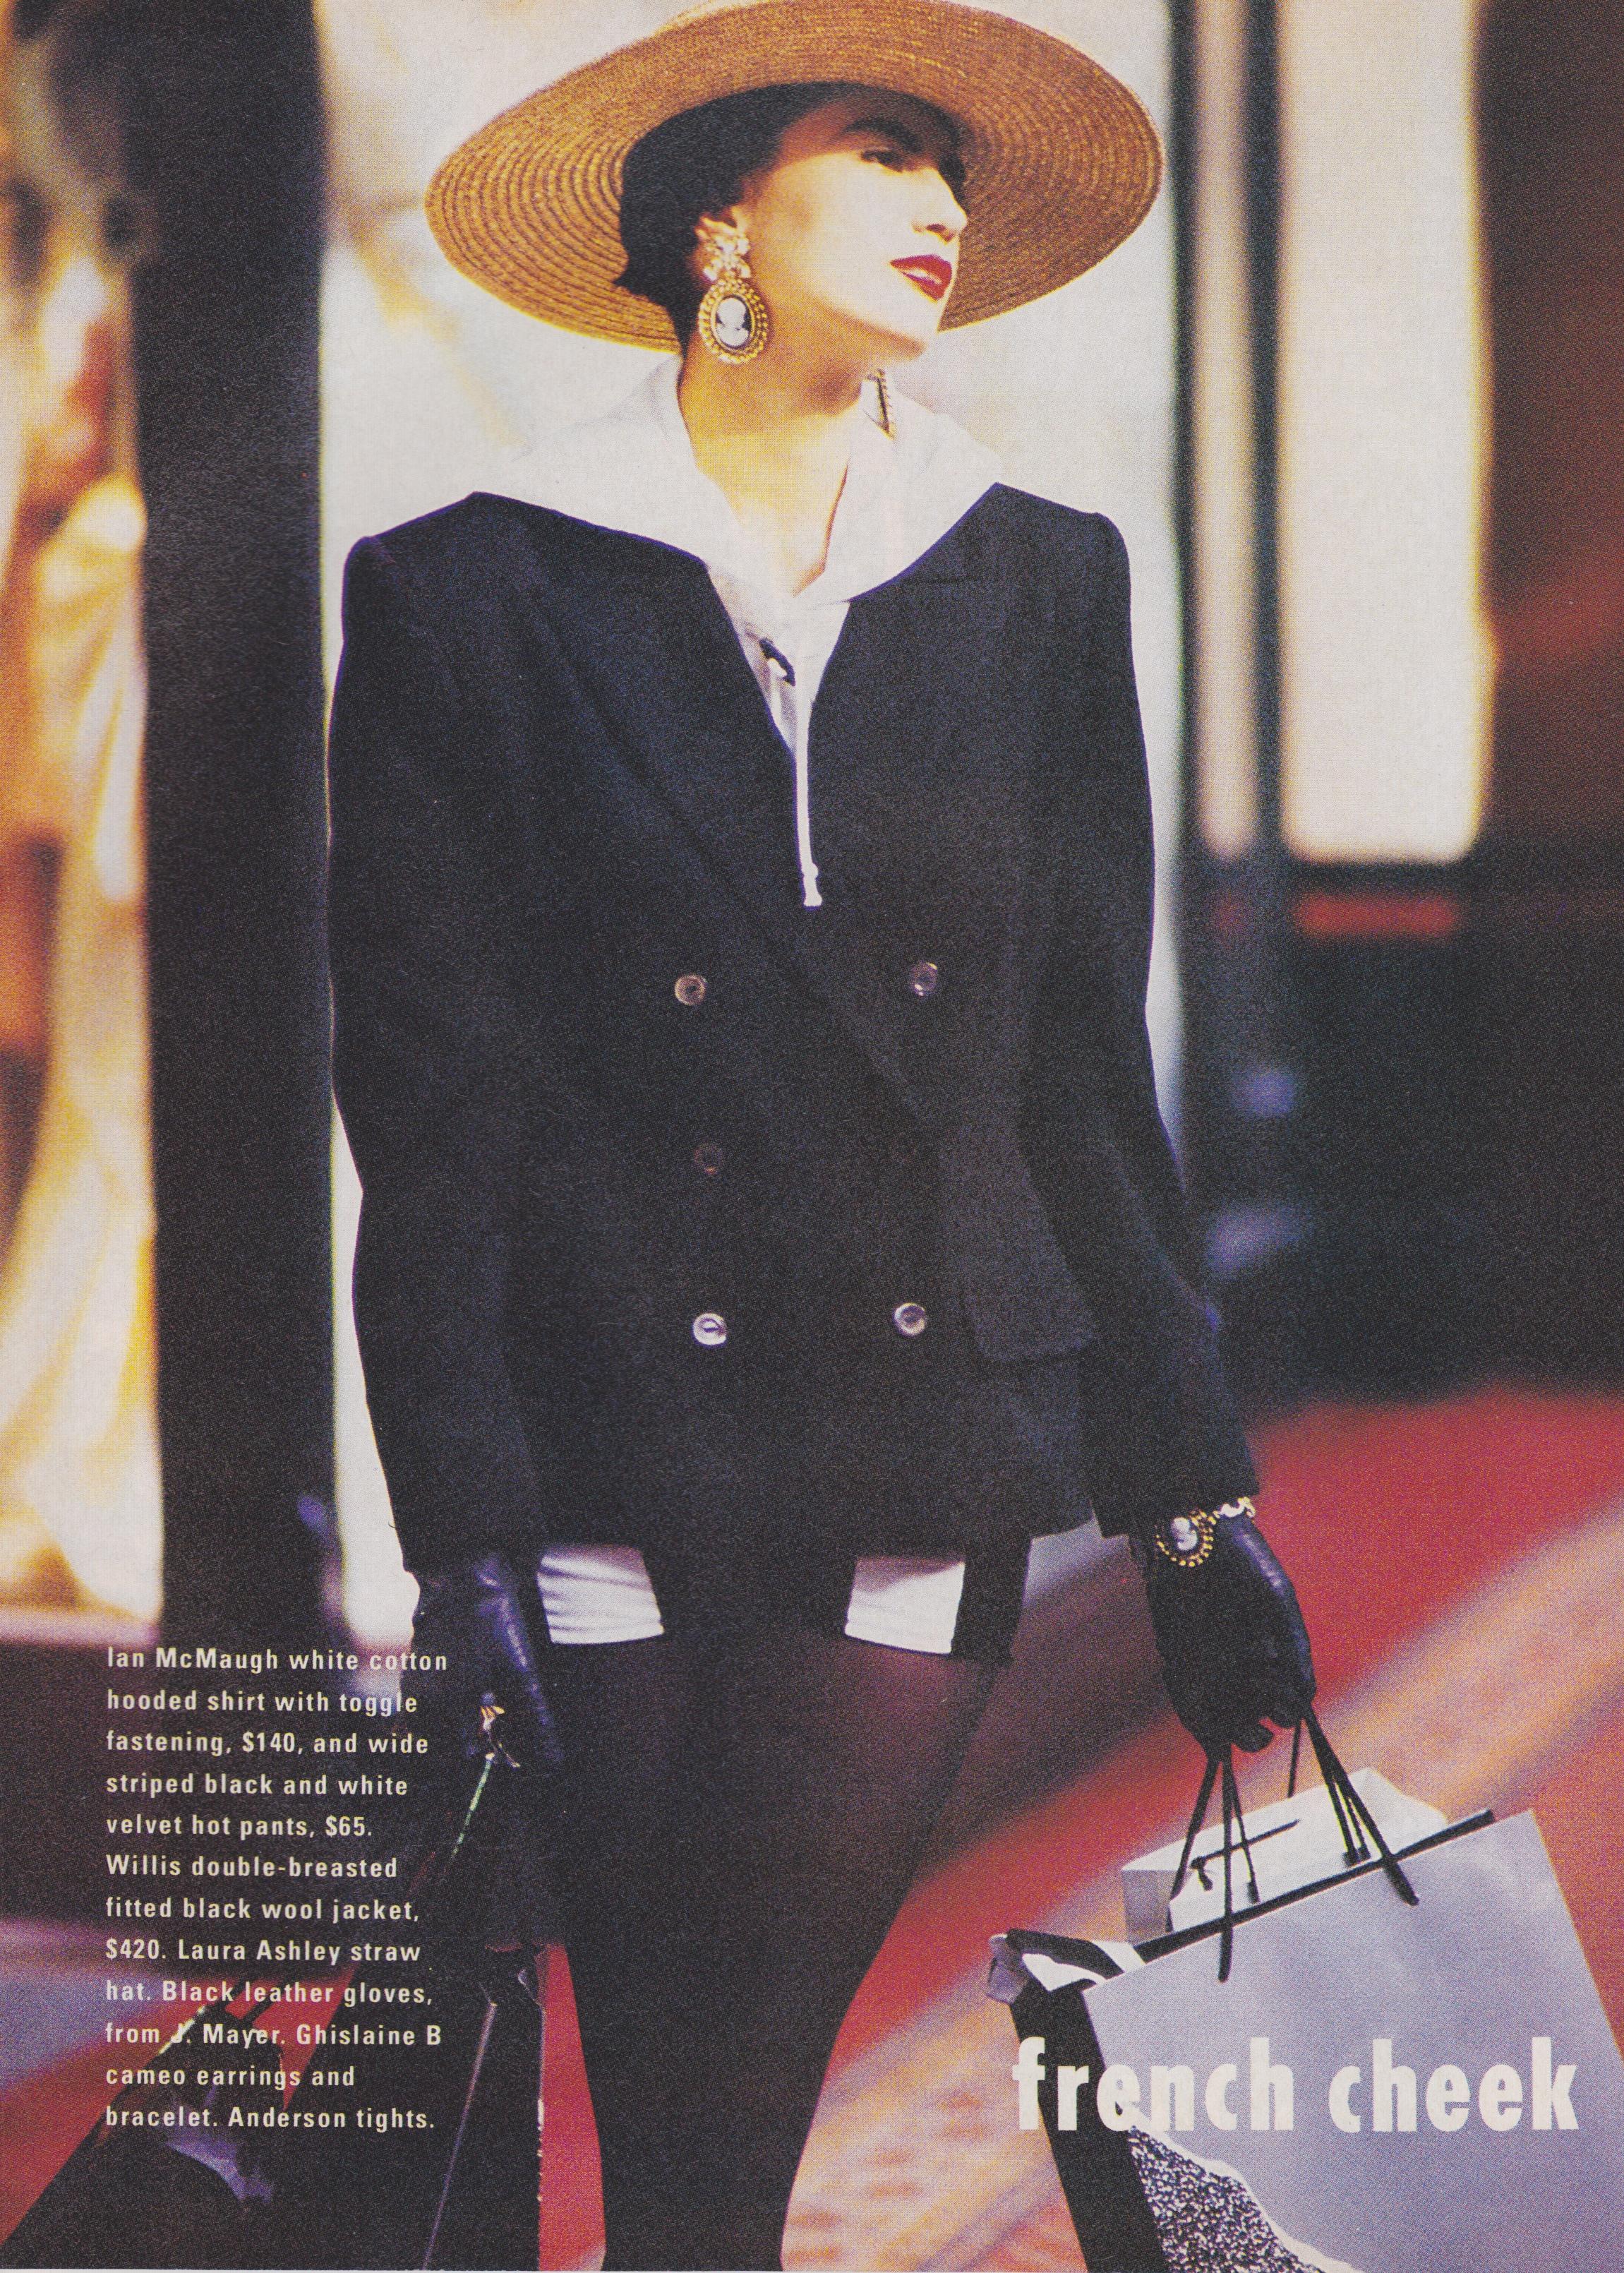 Cosmo June 1990 | International Style 03.jpeg